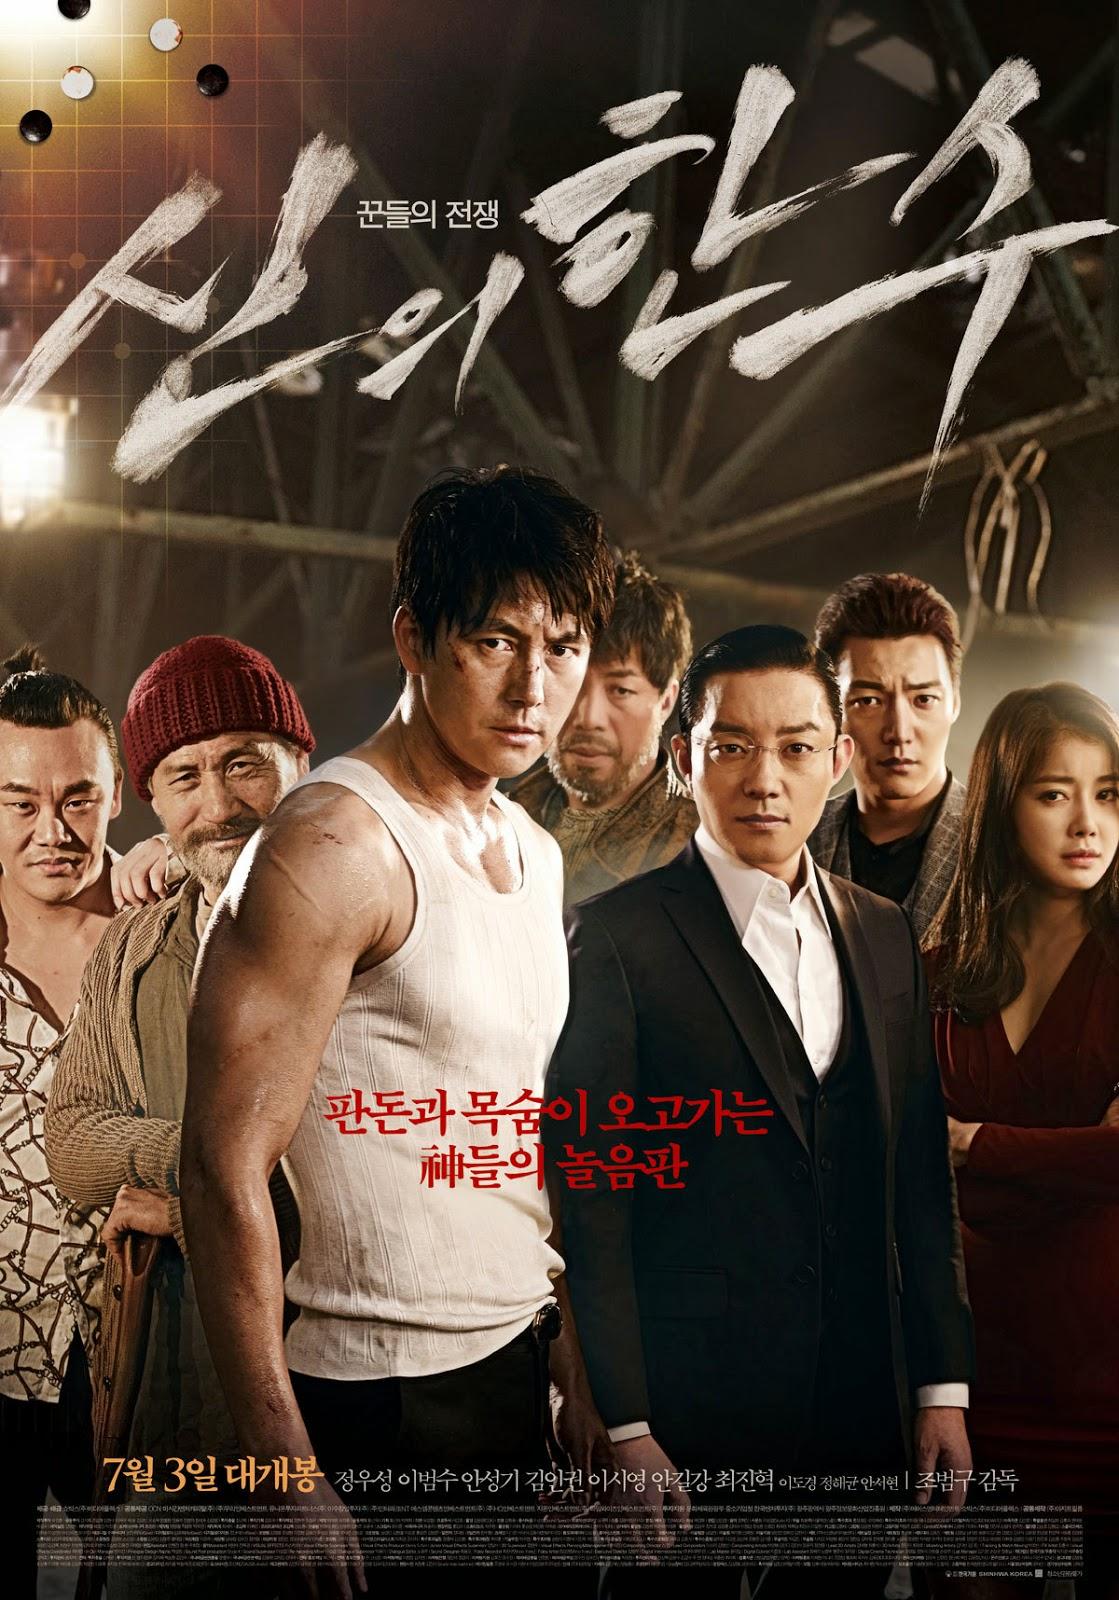 Korean Movie Semi Full 3gp Mp4 Hd Video Download Online